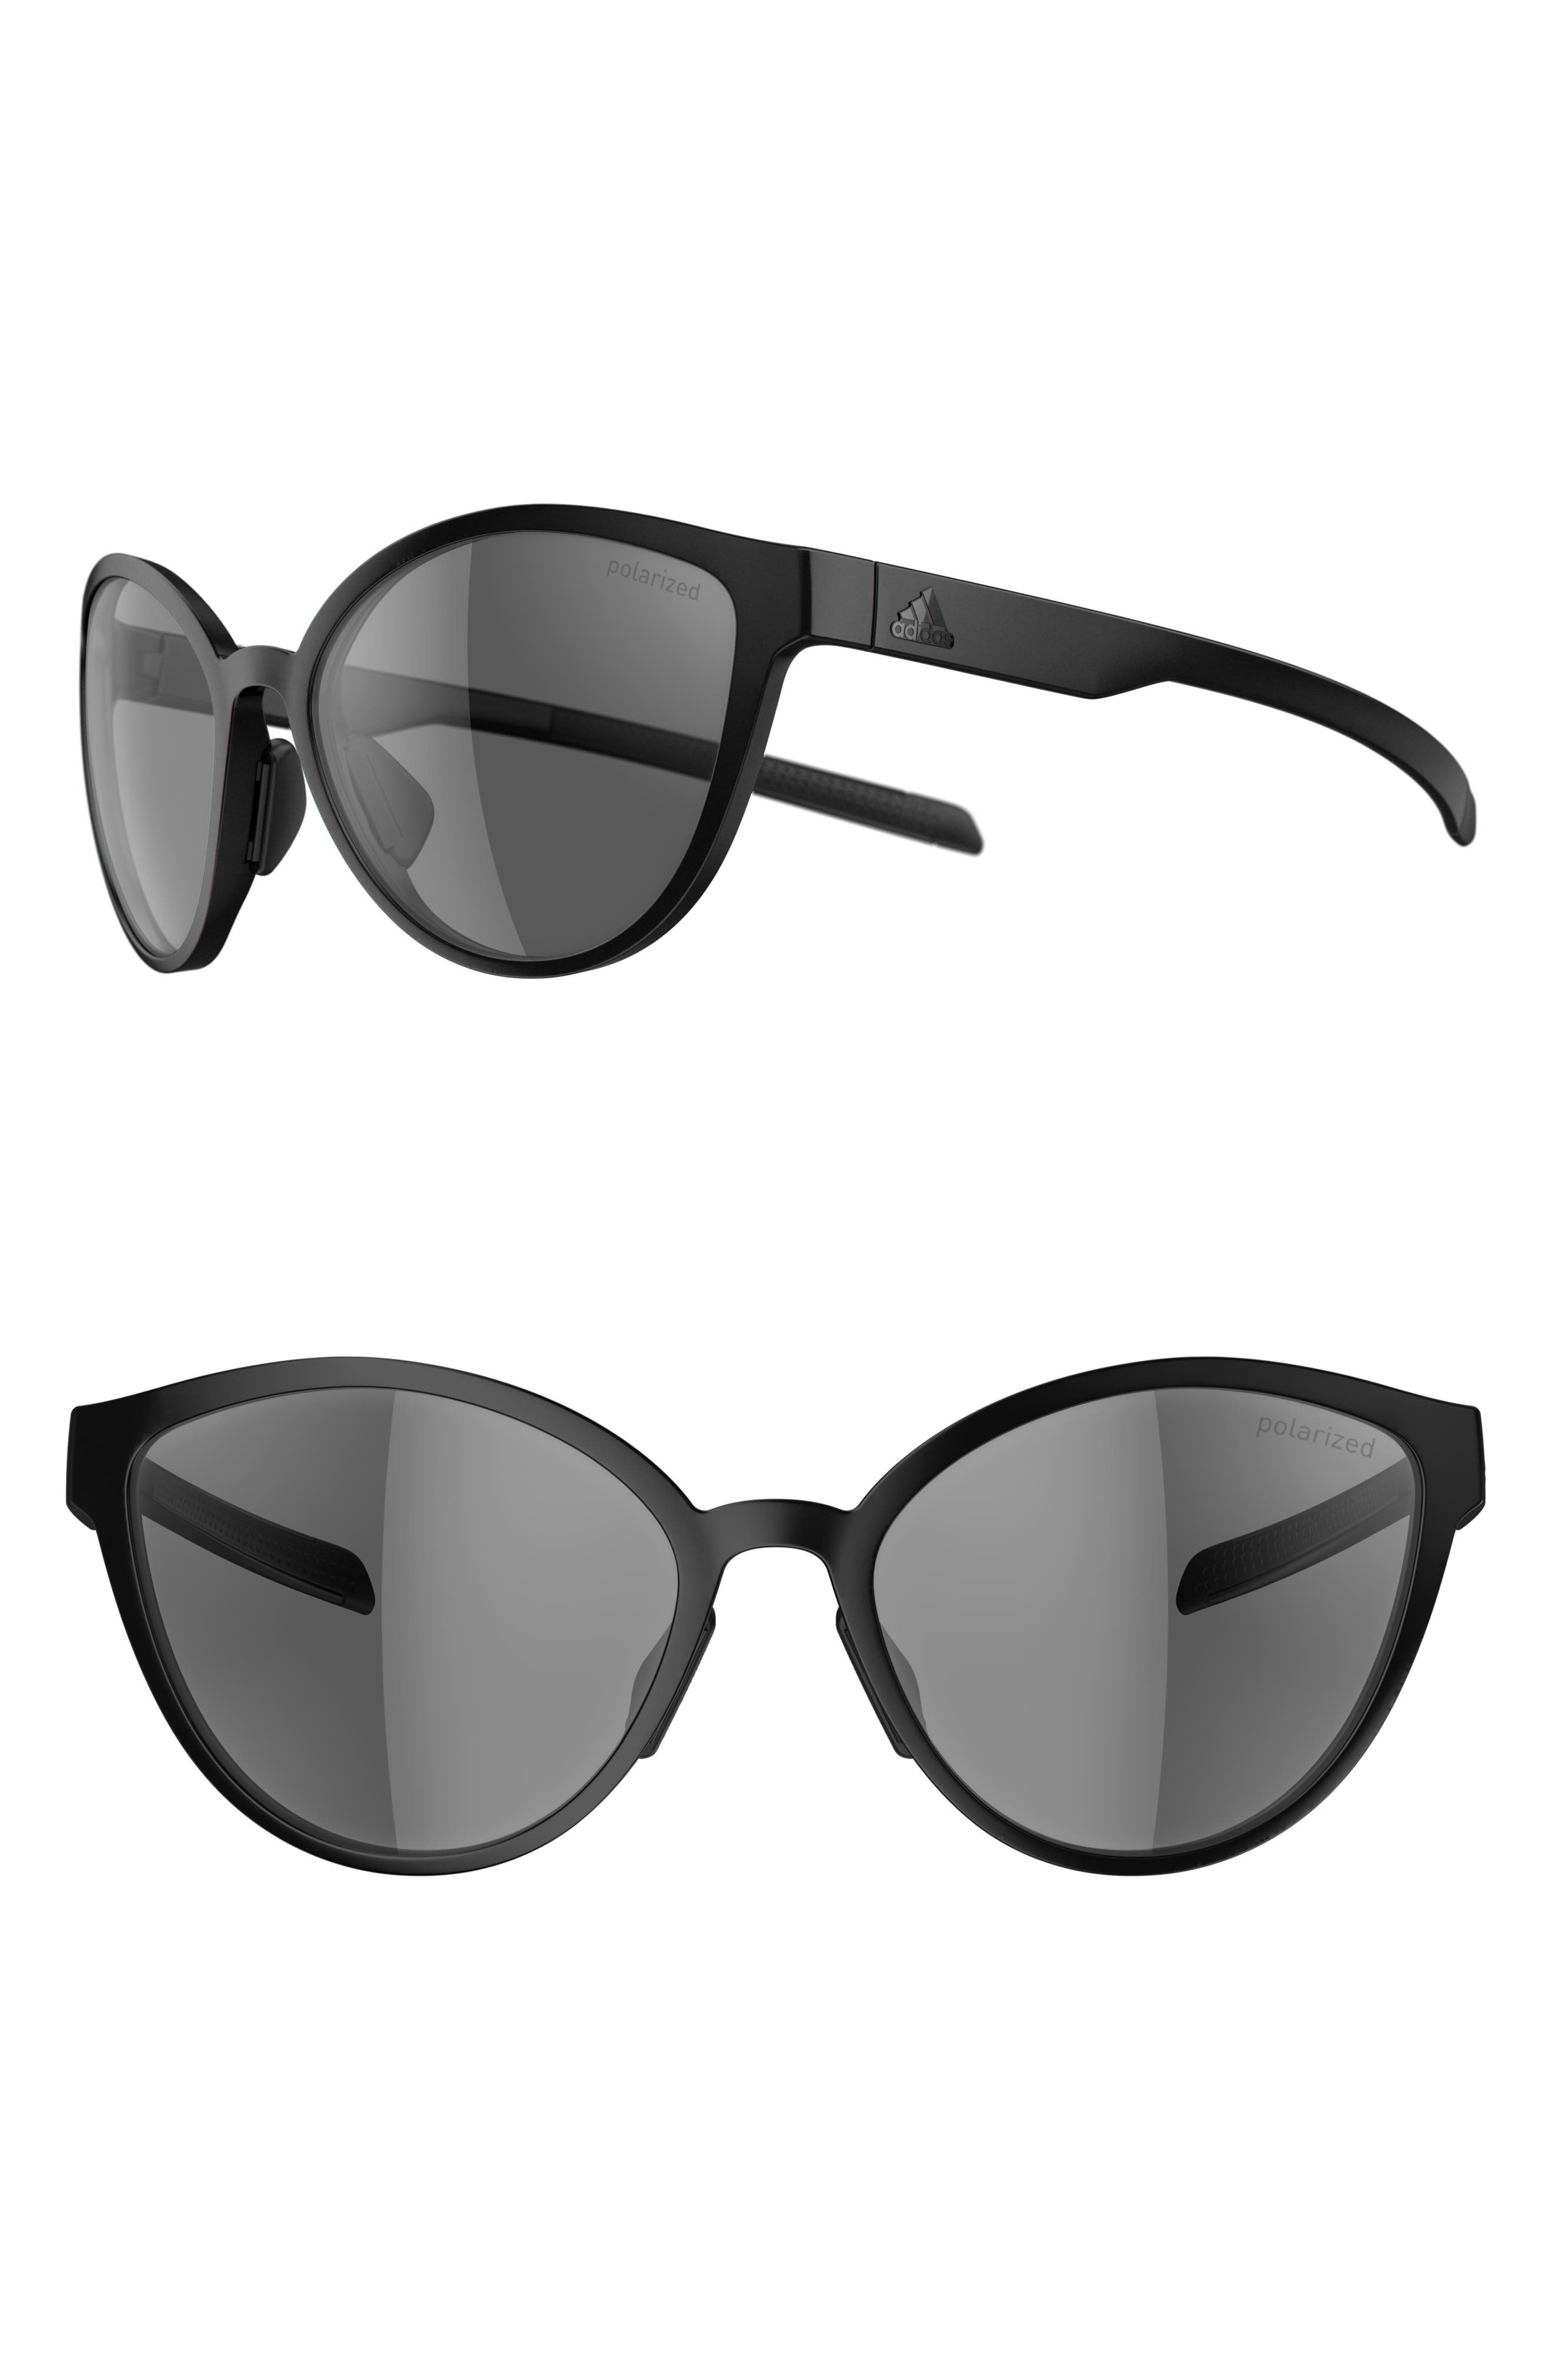 Tempest 56mm Polarized Running Sunglasses,                             Main thumbnail 1, color,                             BLACK MATTE/ GREY